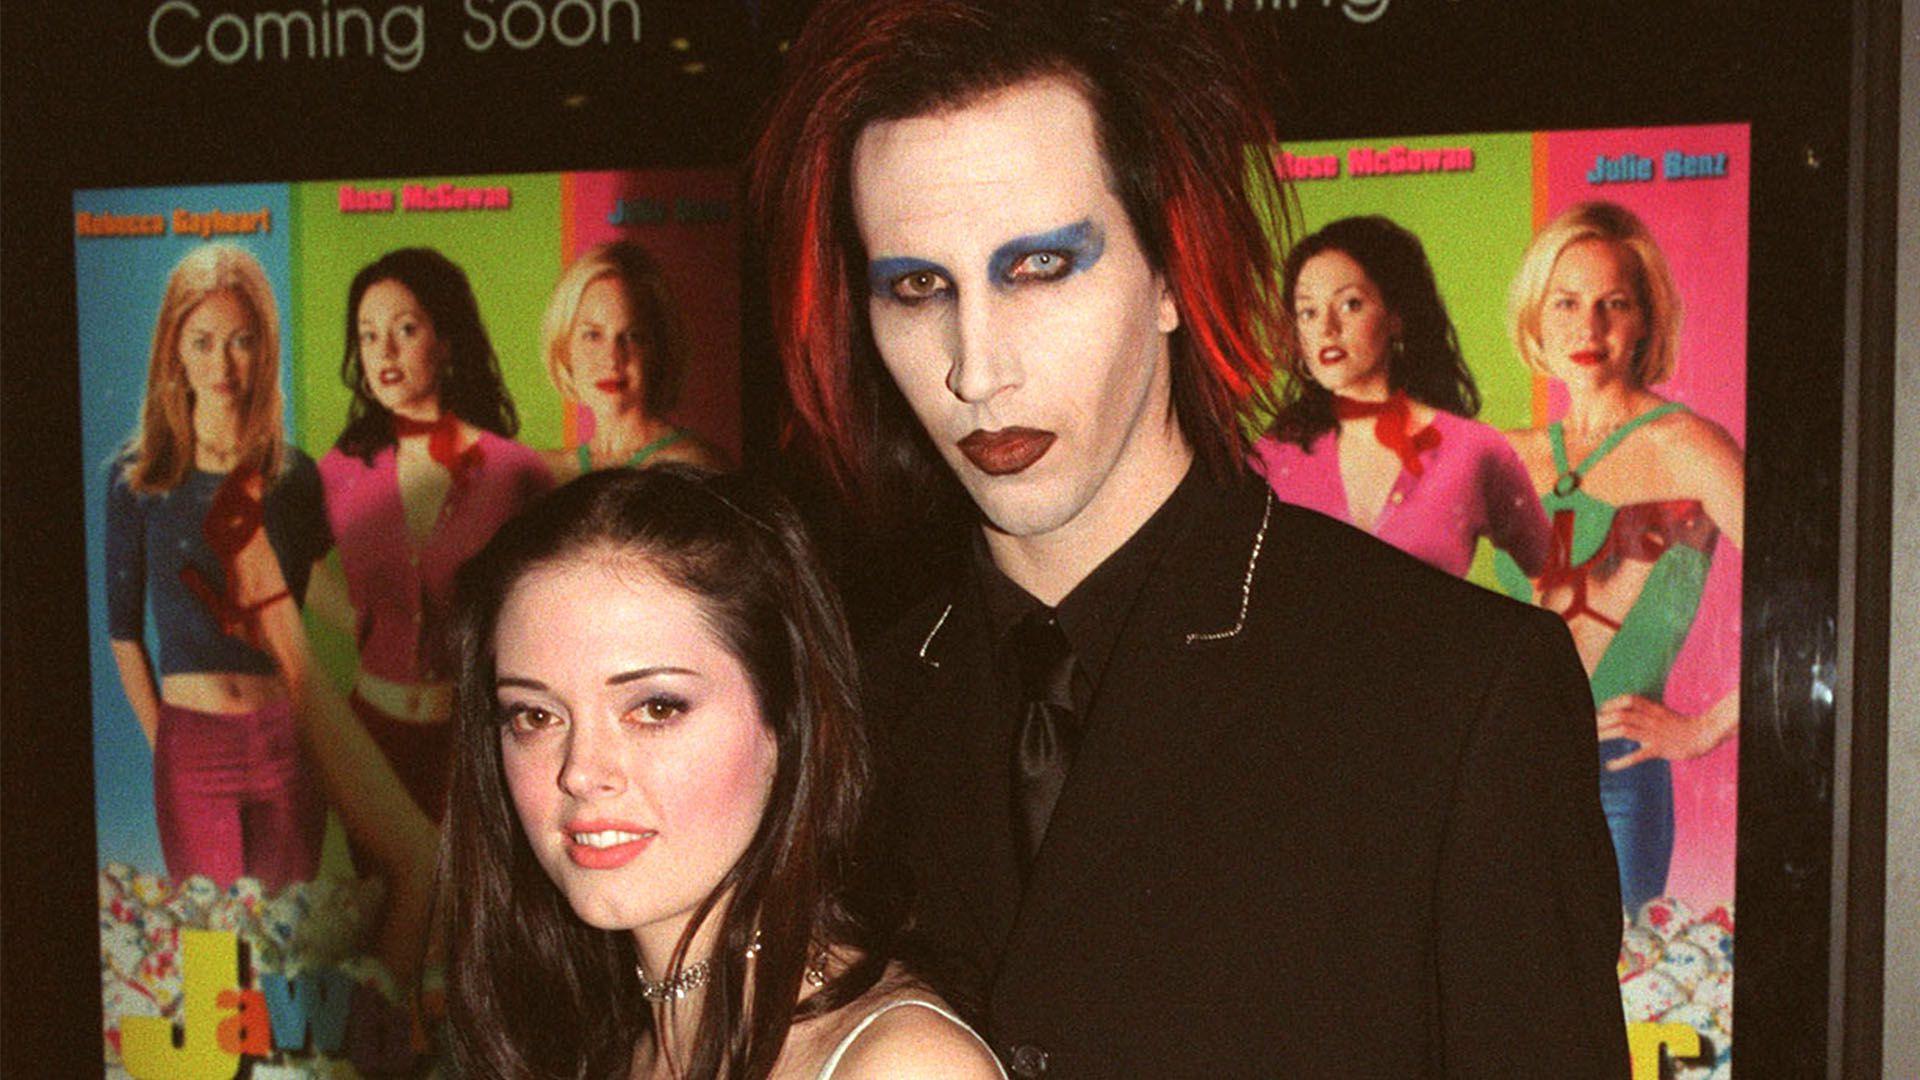 Marilyn Manson Rose McGowan